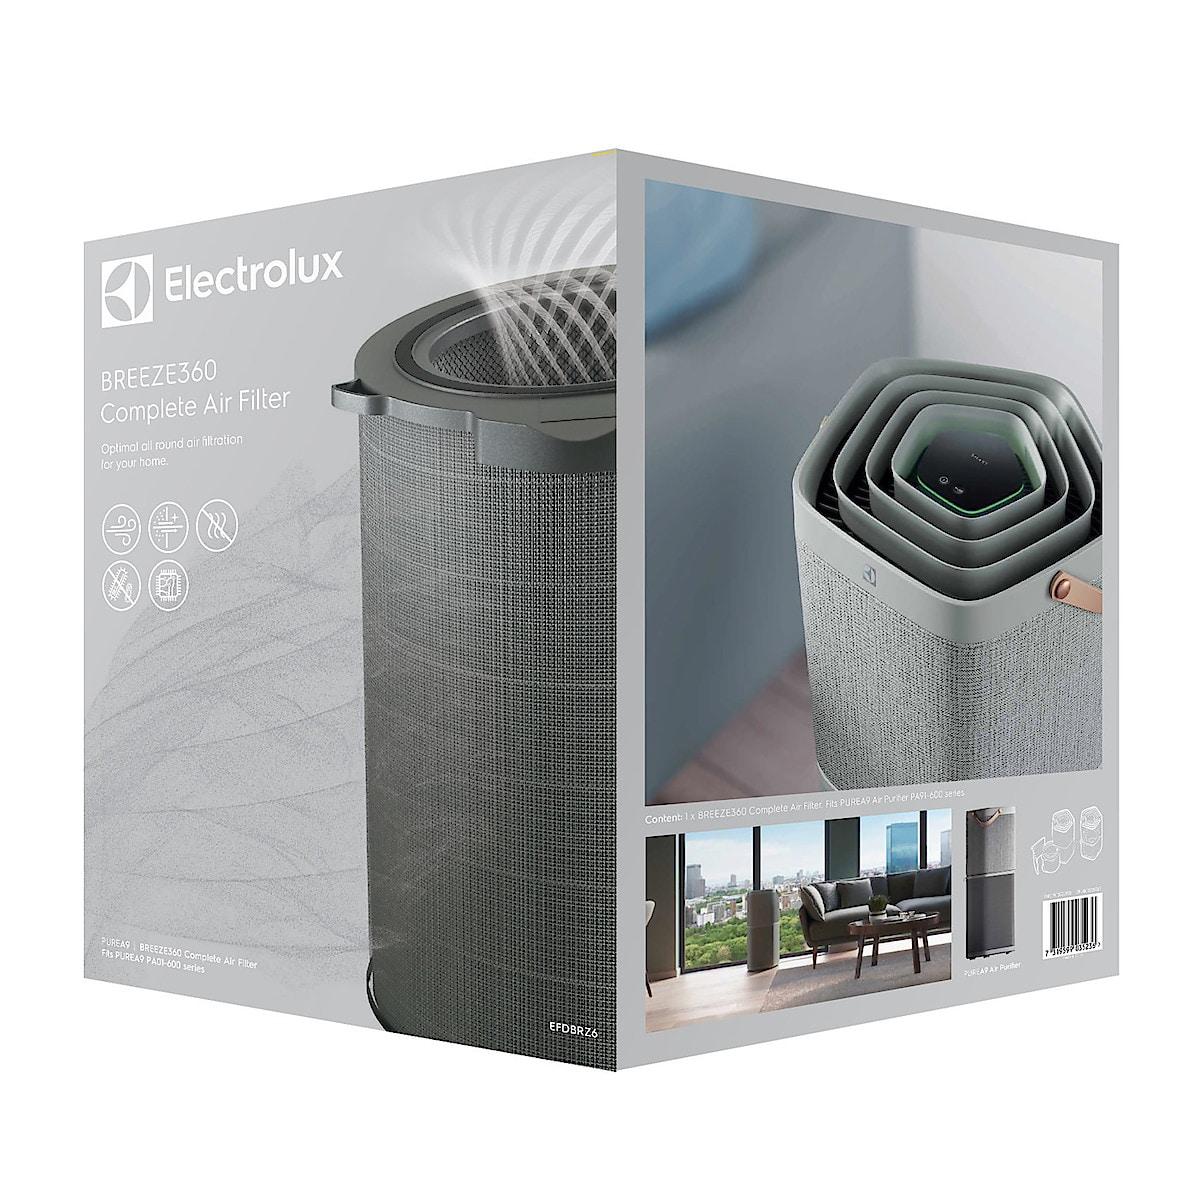 Luftfilter Breze360 til Electrolux Pure PA91-604GY